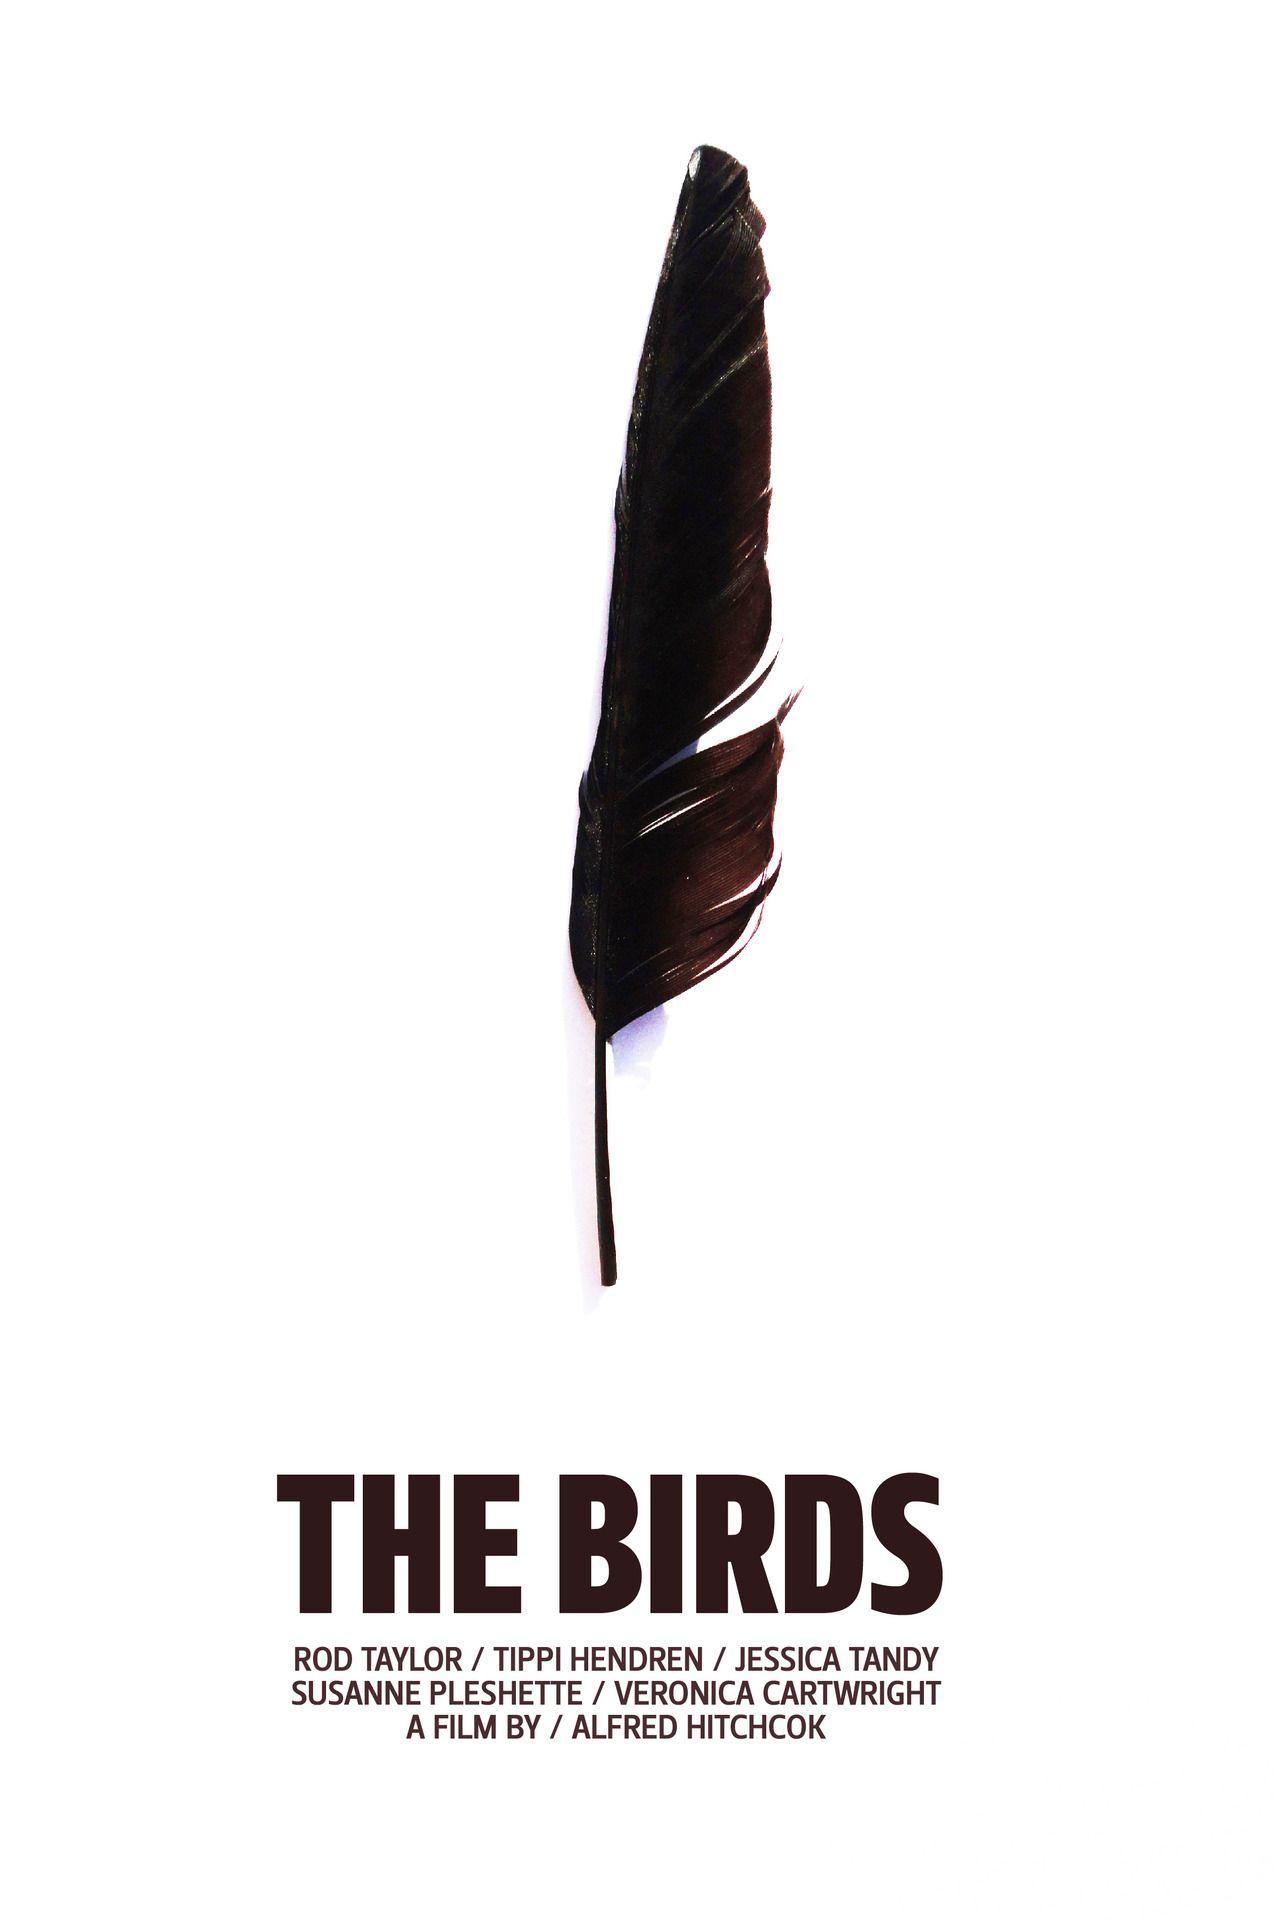 The Birds by Igor Ramos